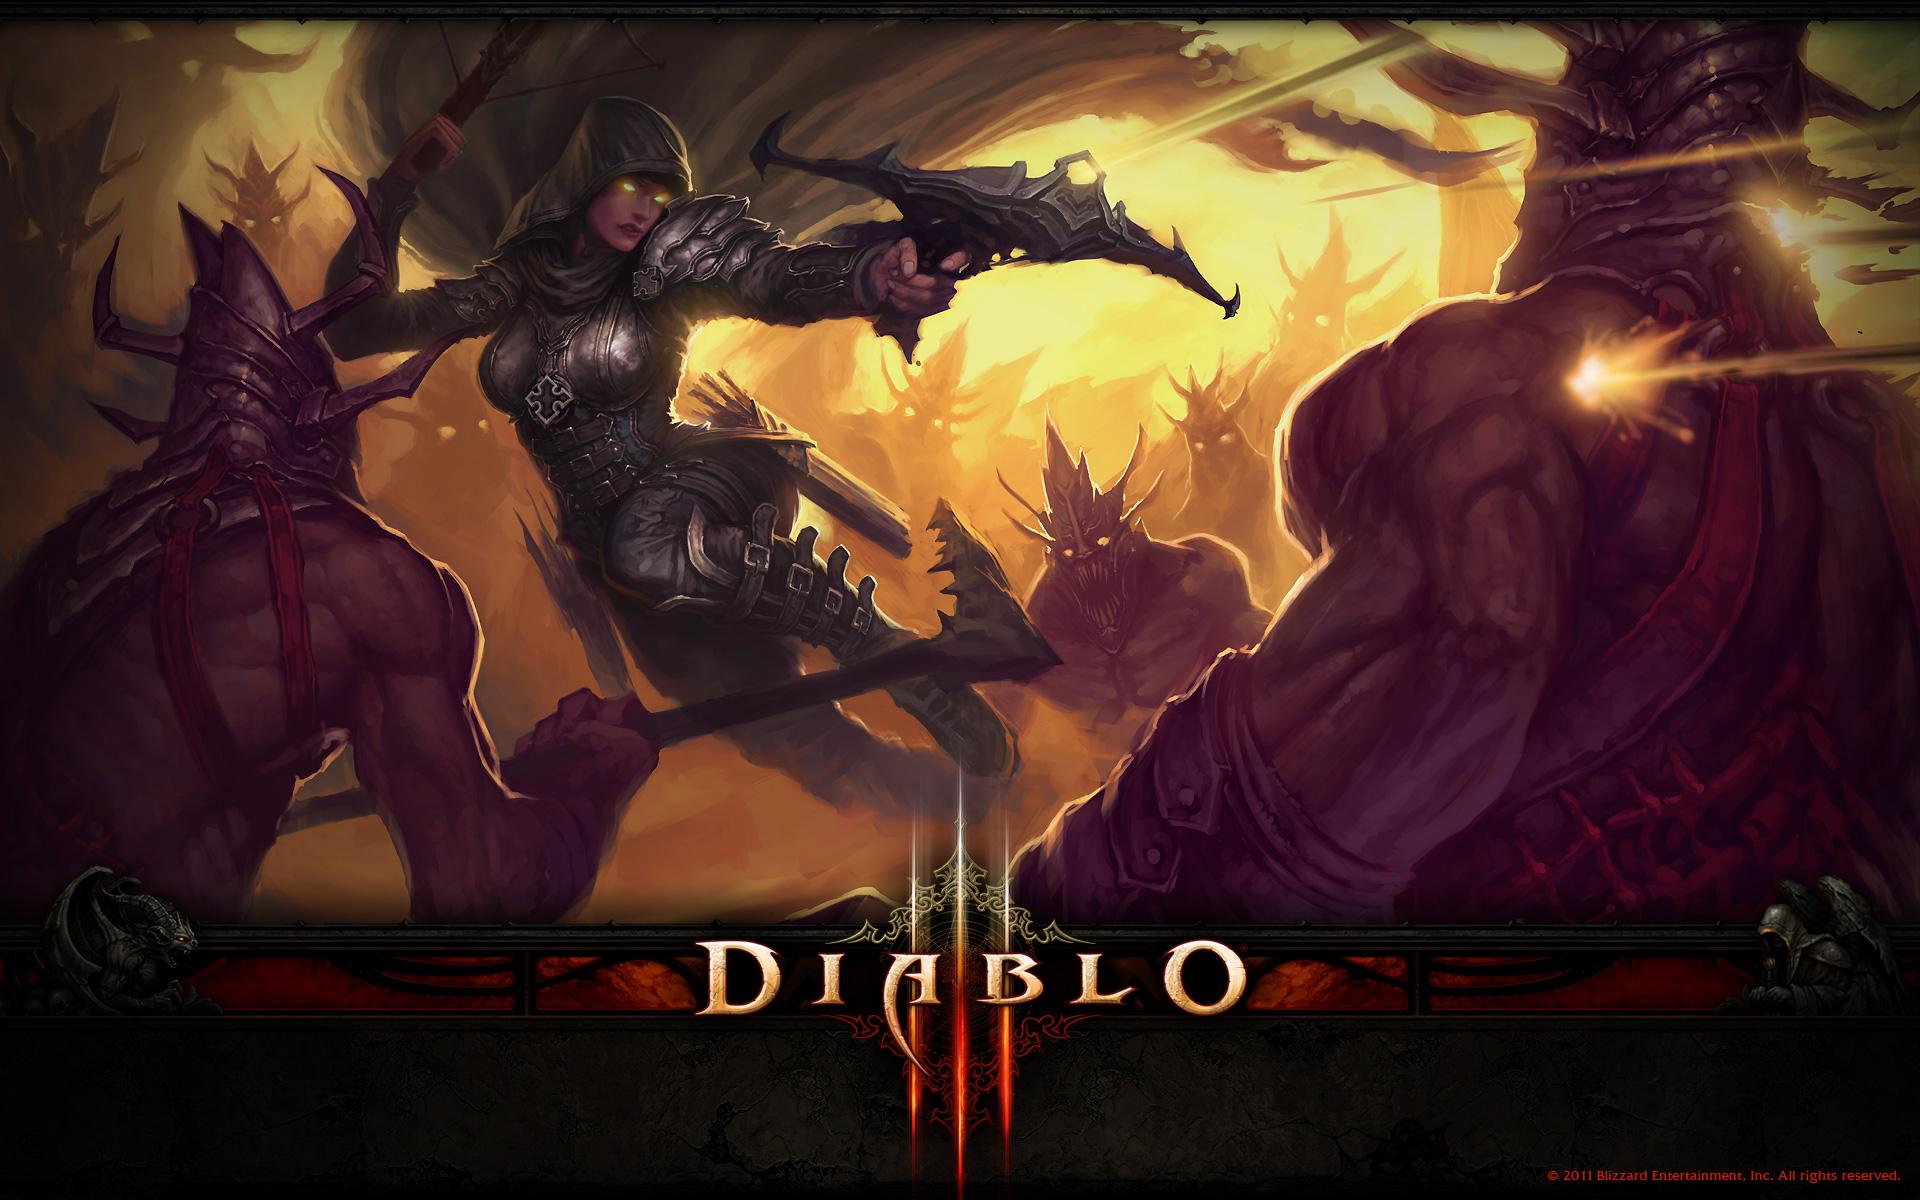 Diablo 3 The Demon Hunter Wallpaper